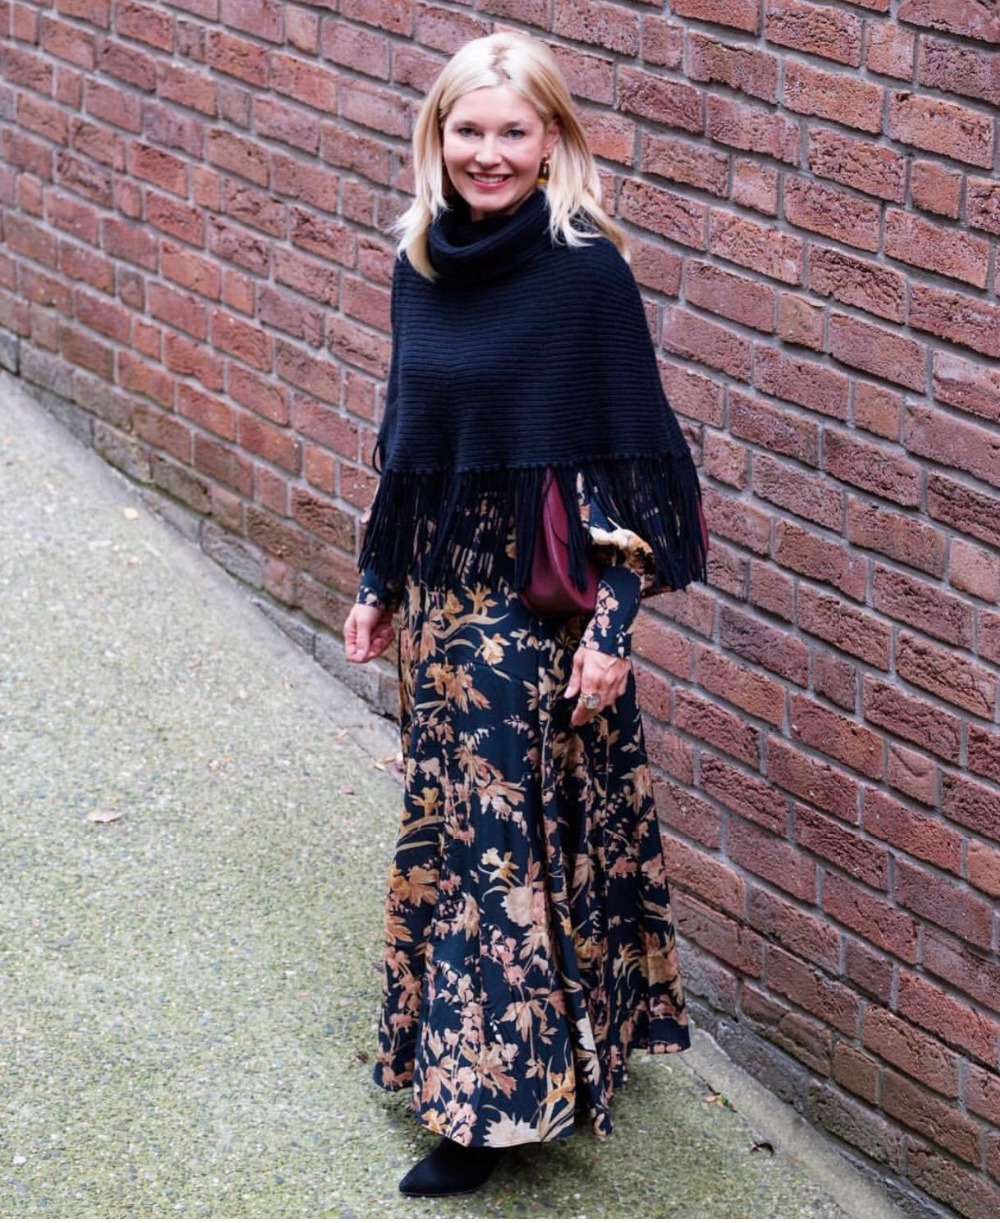 27463b6a0d175 US $206.0 |Aliexpress.com : Buy Women Silk Black Jonquil Floral print Long  Blouson Sleeves Unbridled Basque Bias Cut Maxi Dress from Reliable Dresses  ...